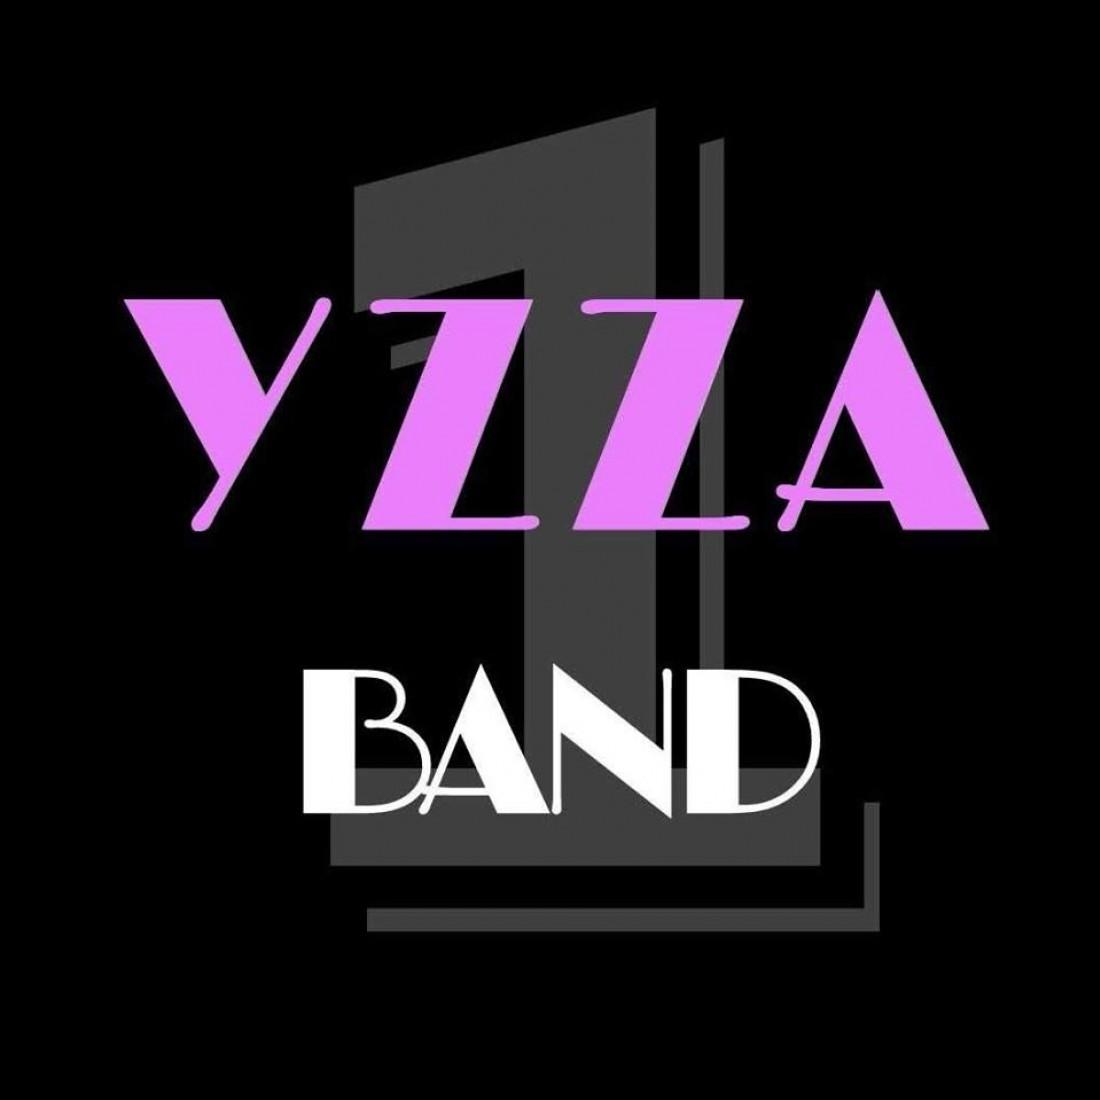 YZZA Band